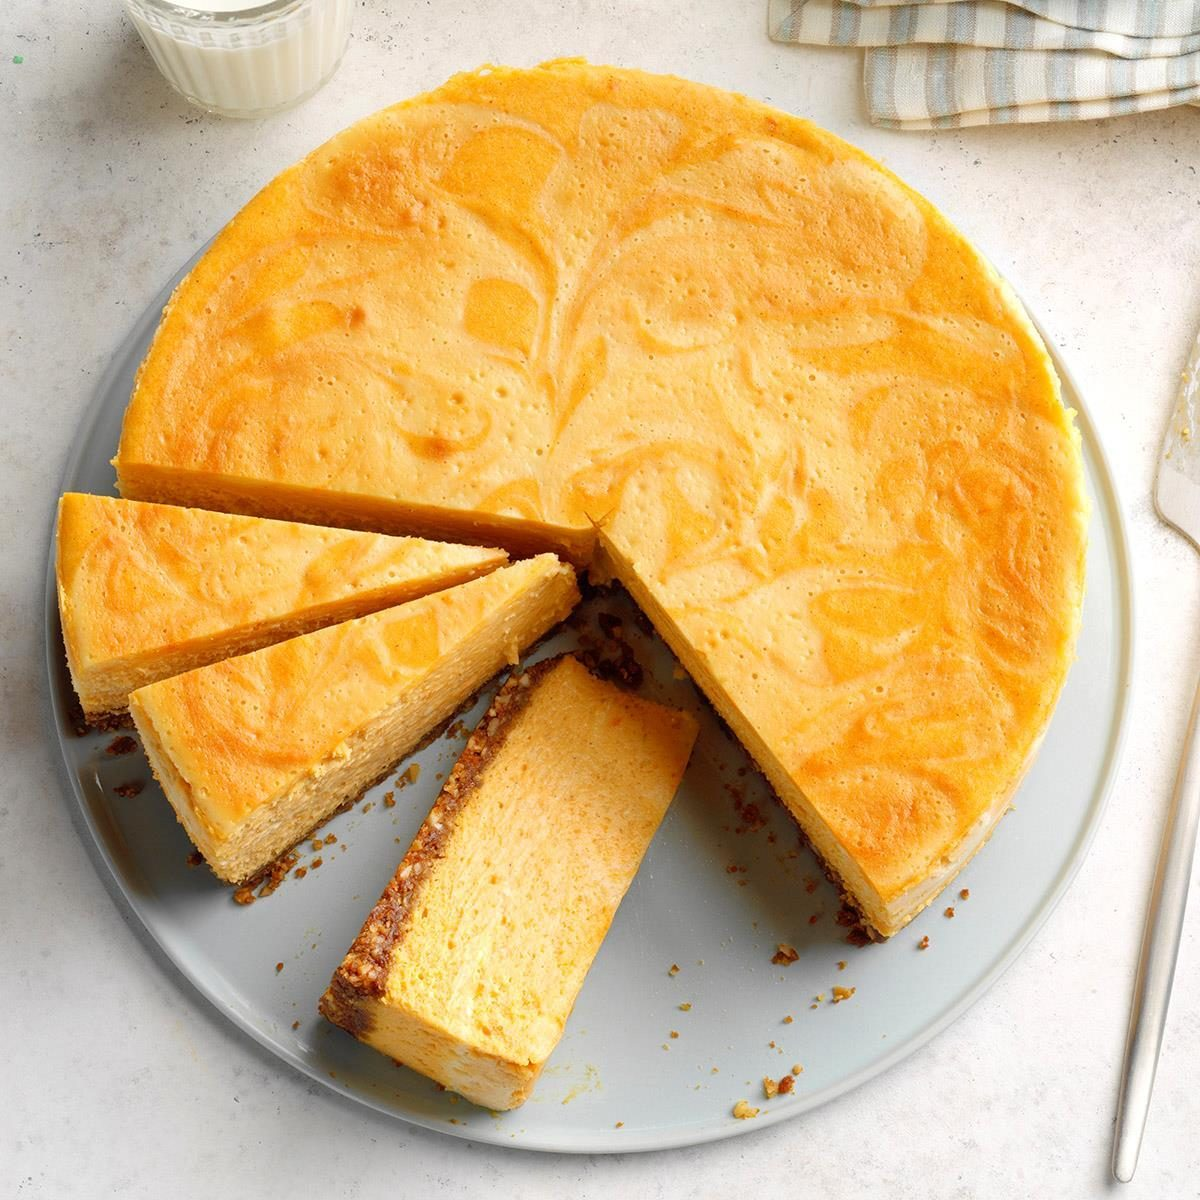 Connecticut: Sweet Potato & Marshmallow Swirl Cheesecake